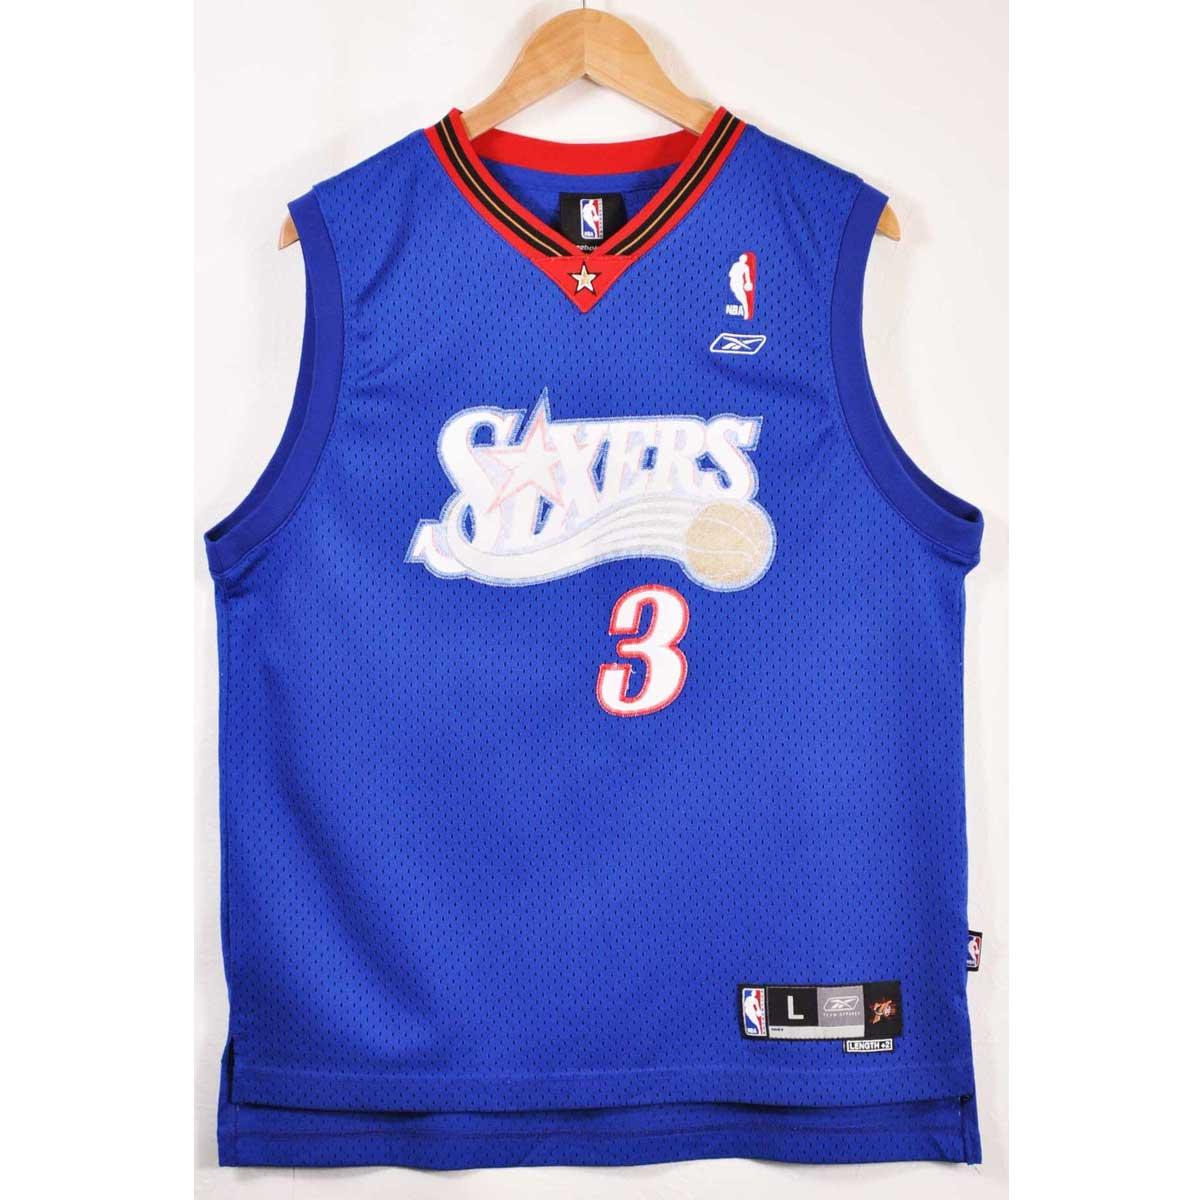 size 40 e977a 8e636 Reebok Reebok NBA Philadelphia 76ers Philadelphia 76ers Allen Iverson  basketball tank top uniform numbering blue Lady's L is considerable▼